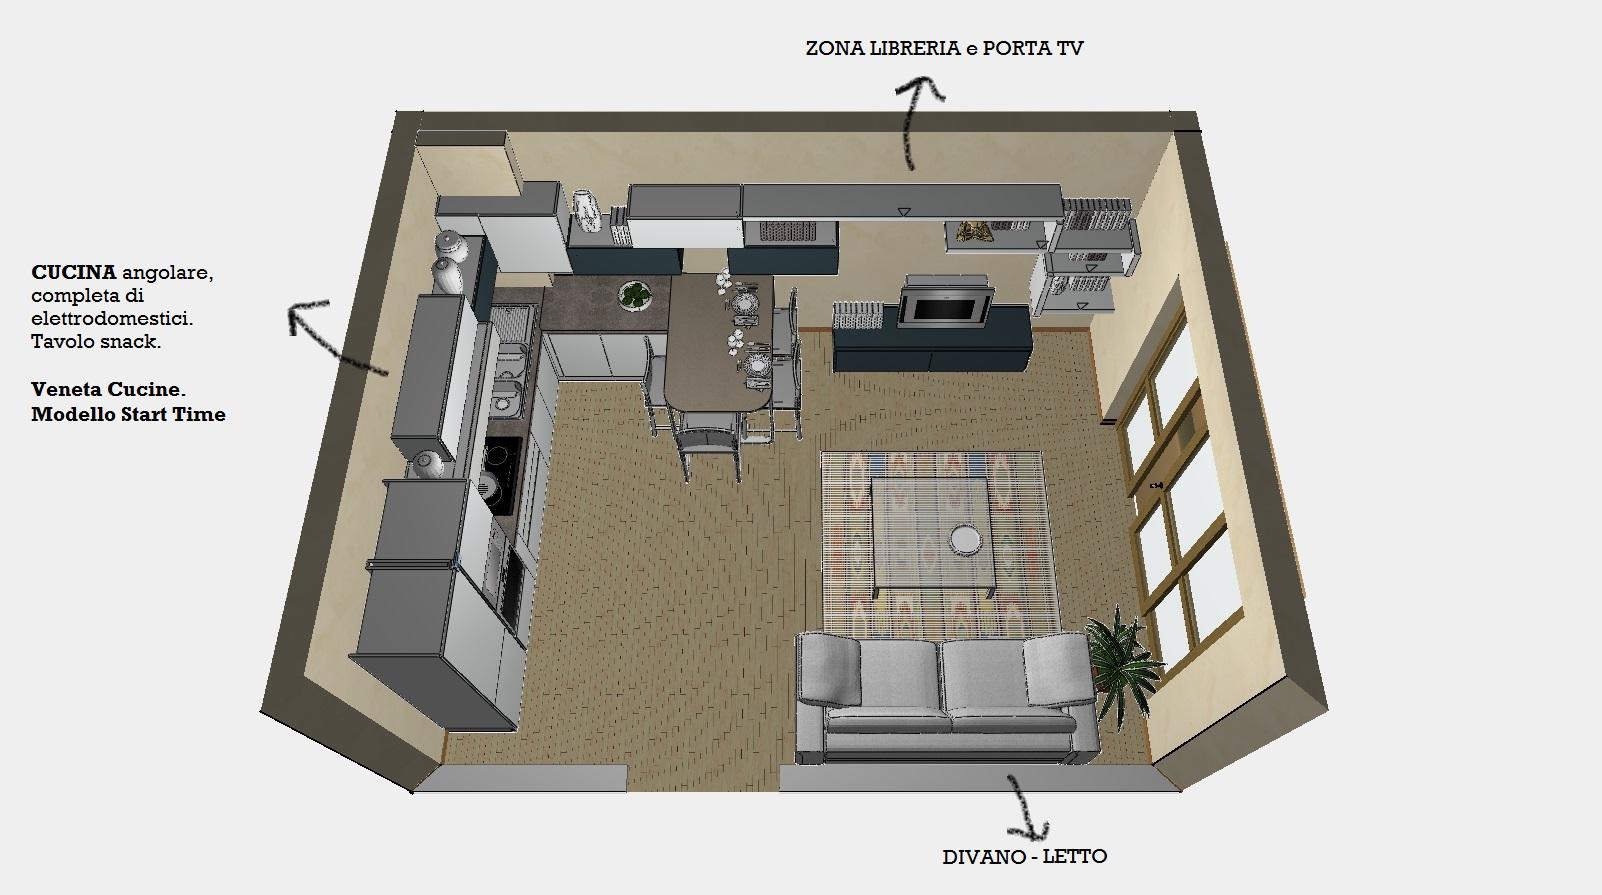 vista dall'alto ambiente unico cucina e zona living